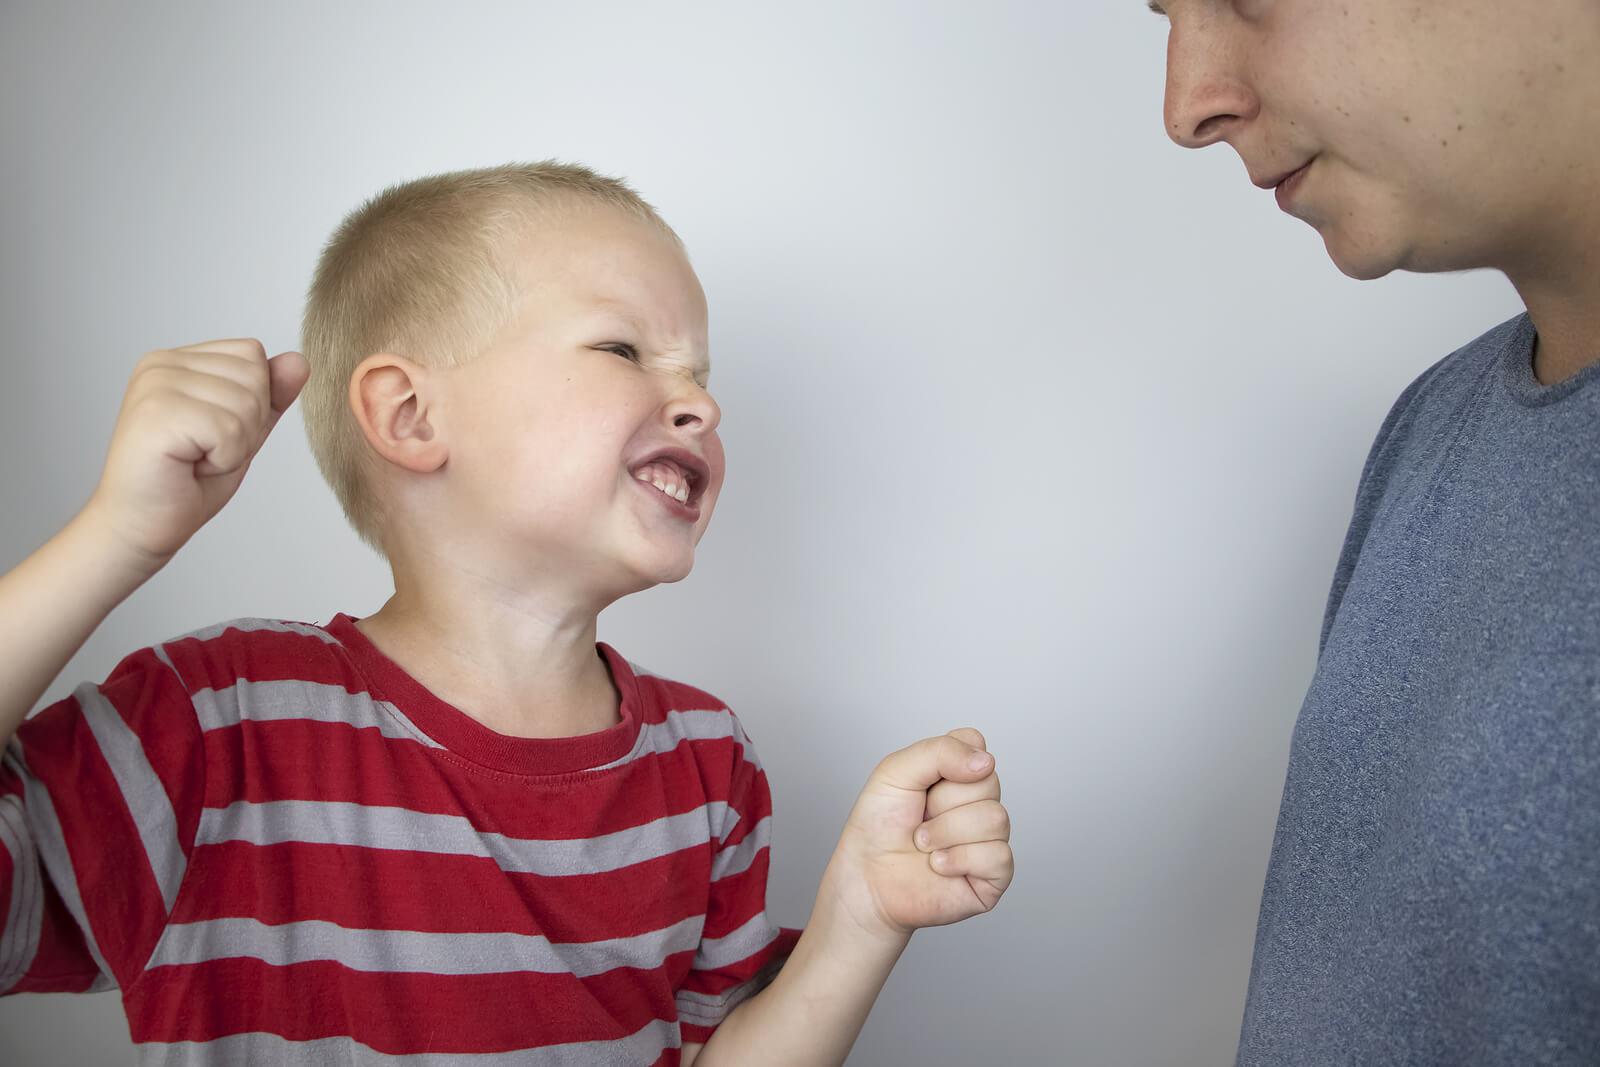 Niño enfadado desafiando a su padre.